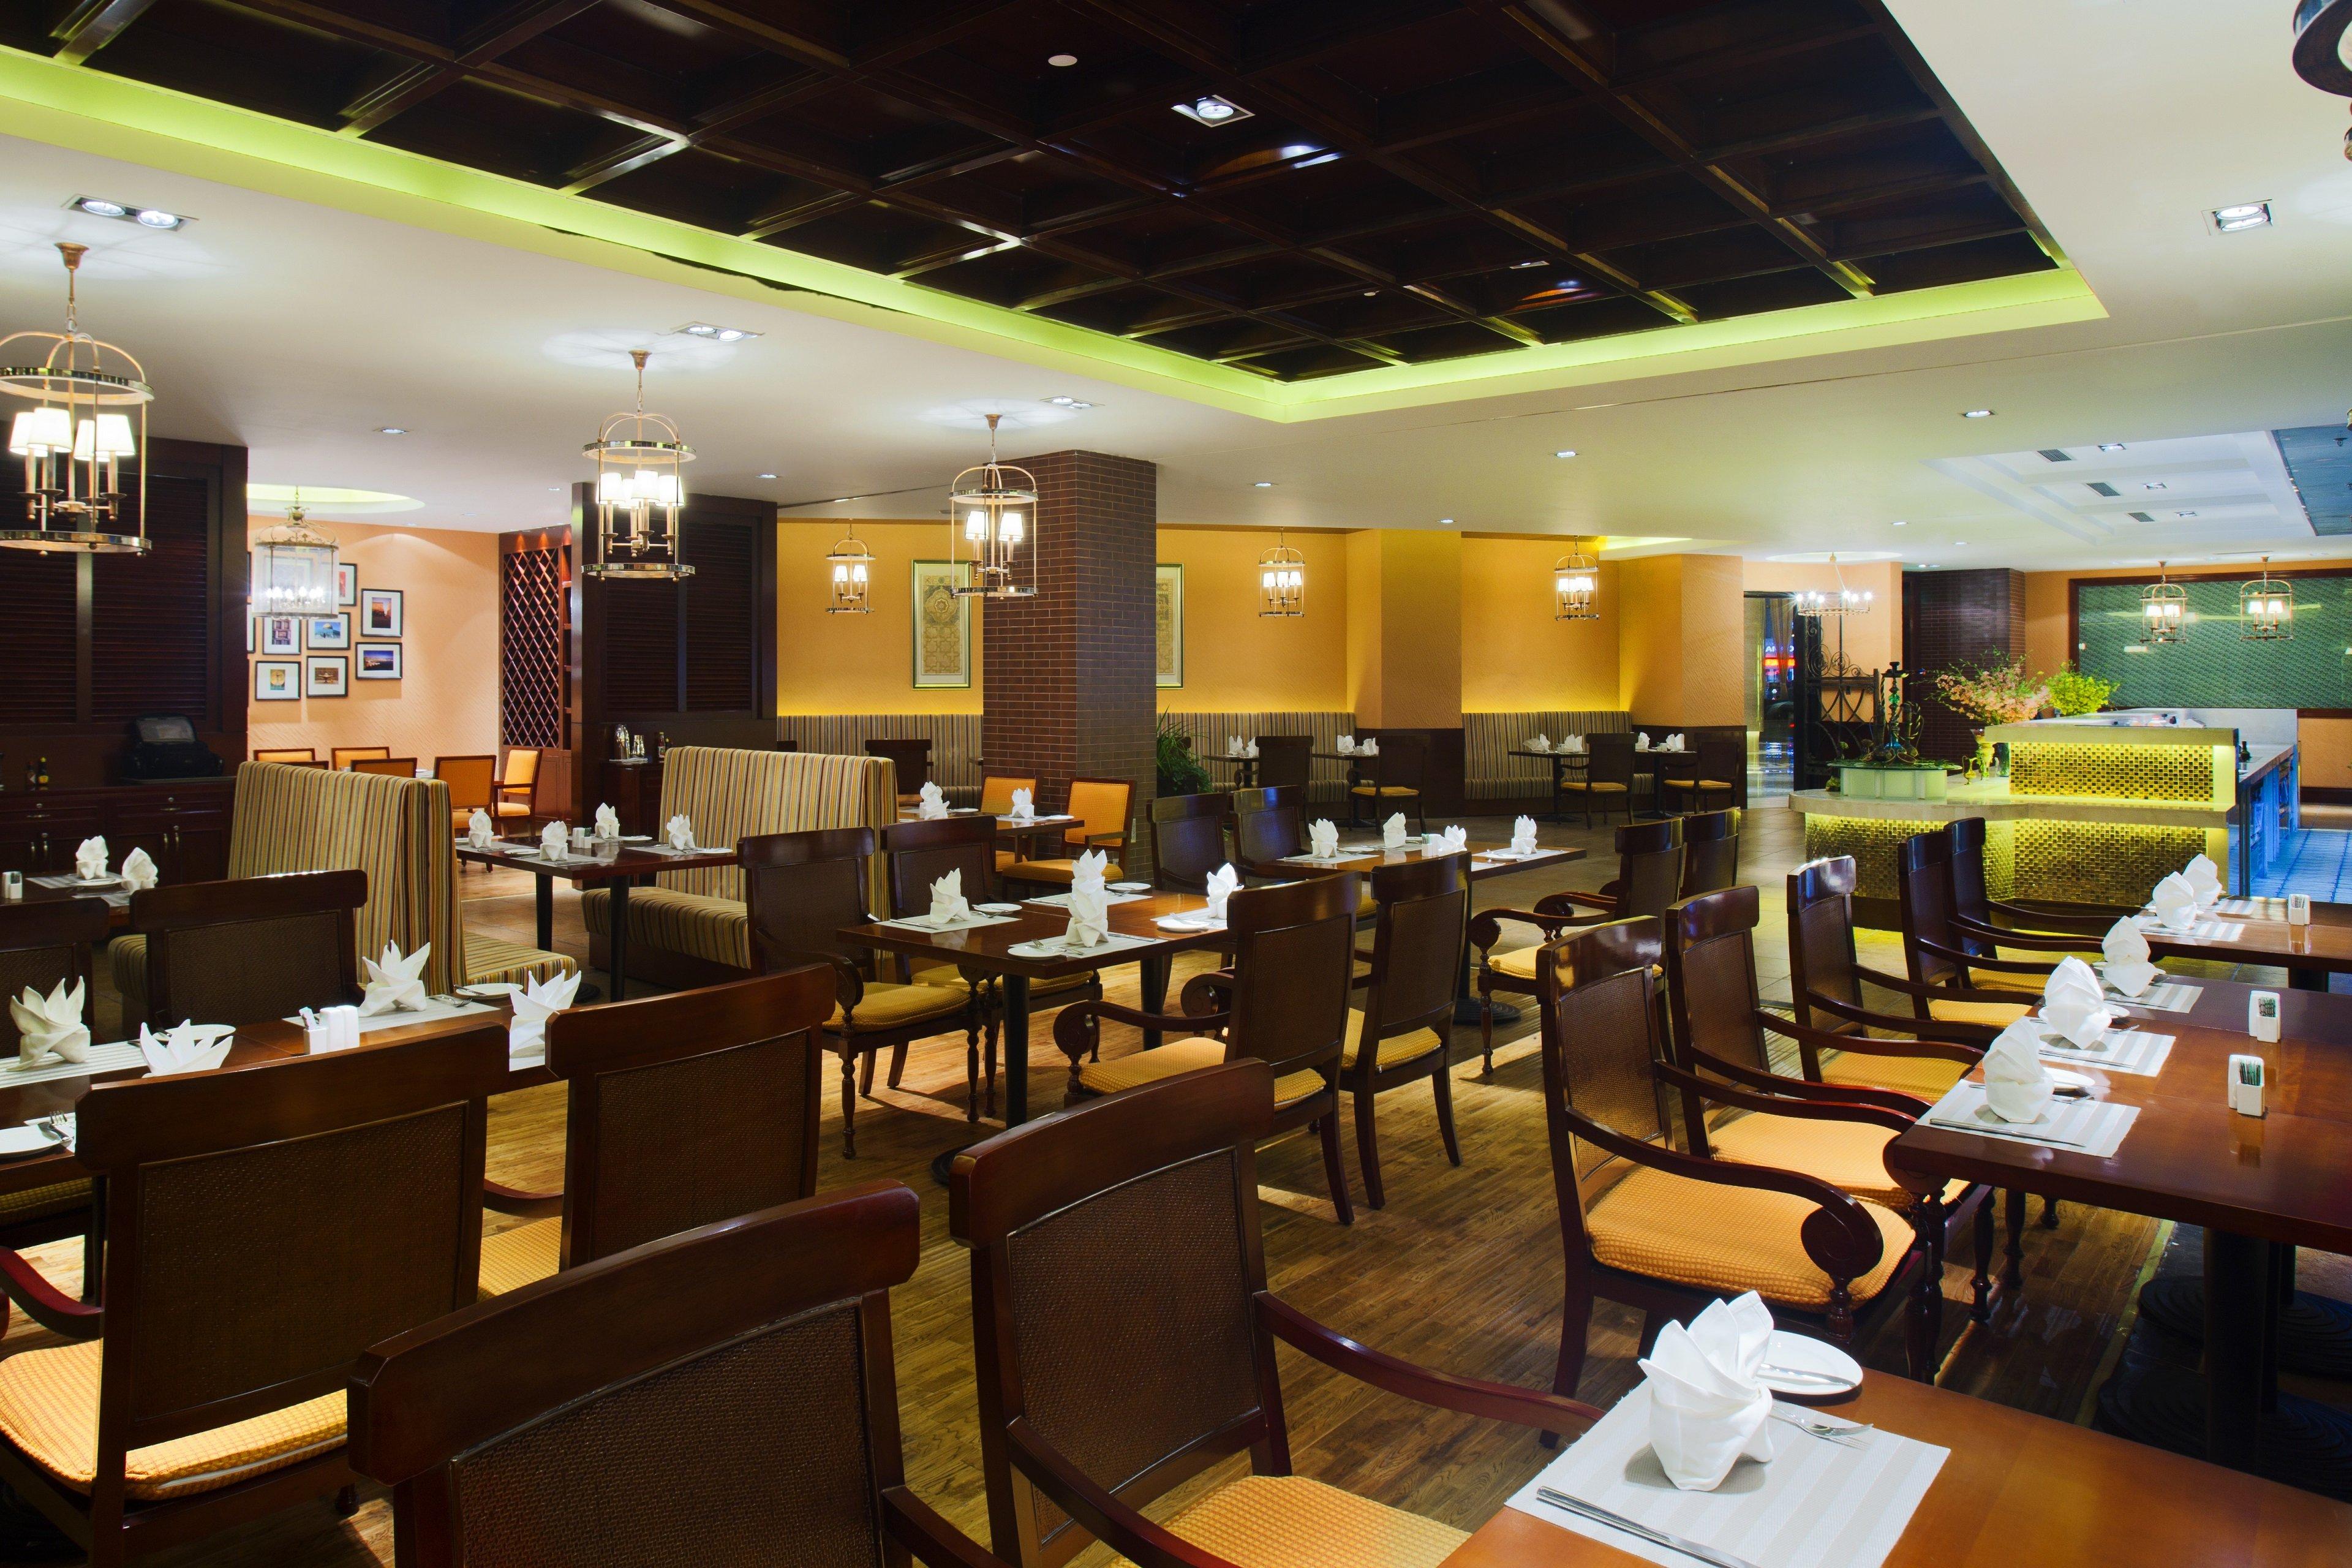 Holiday Inn Yinchuan Int l Trade Centre, Yinchuan